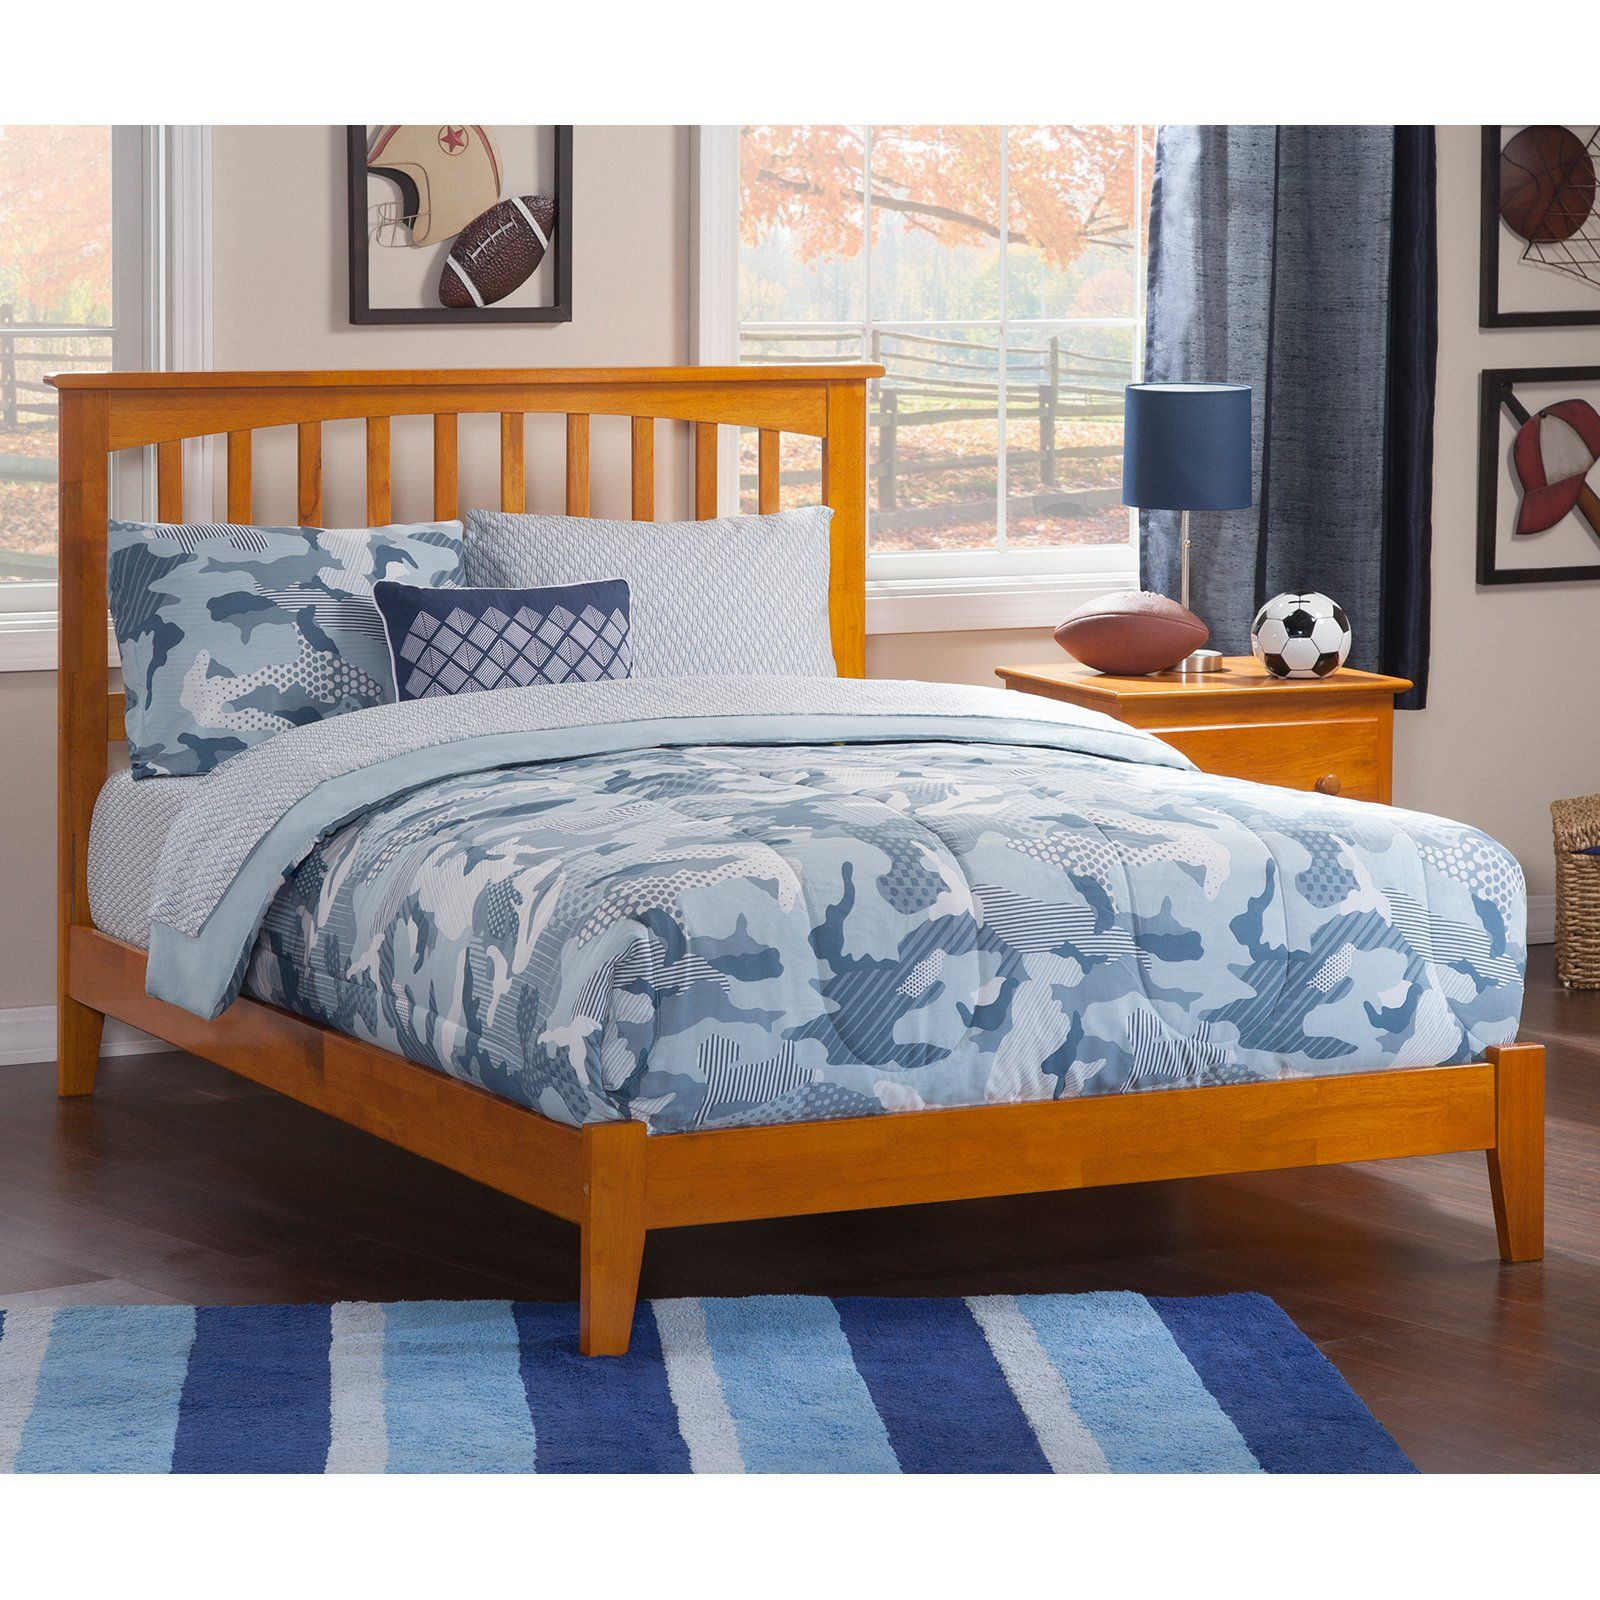 Atlantic Furniture Mission Traditional Platform Bed Caramel Size Full Atlantic Furniture Traditional Platform Beds Furniture